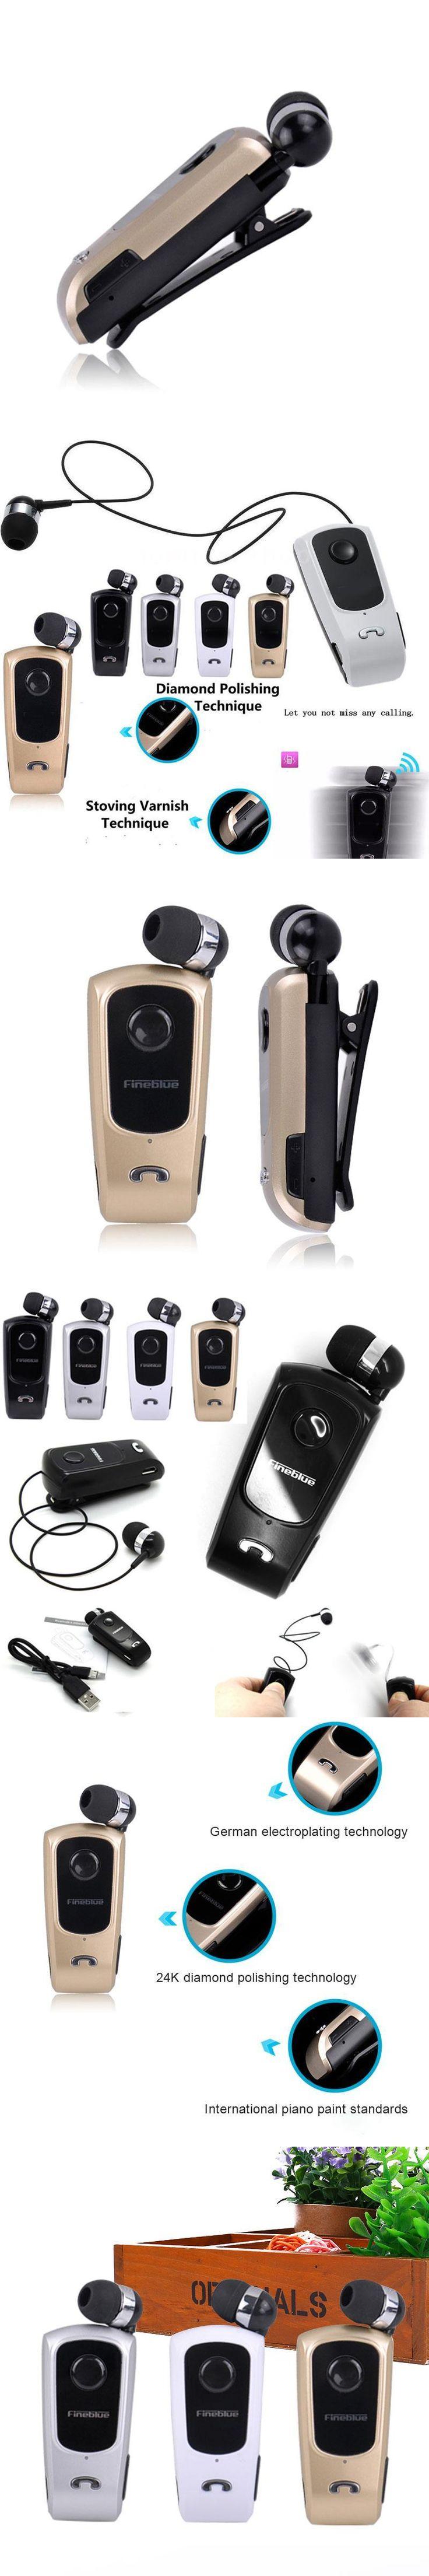 FineBlue F920 Wireless Earpiece Earphone Hnadsfree Bluetooth Clip Headset Vibration Cordless Headphone for Samsung s6 s7 phone